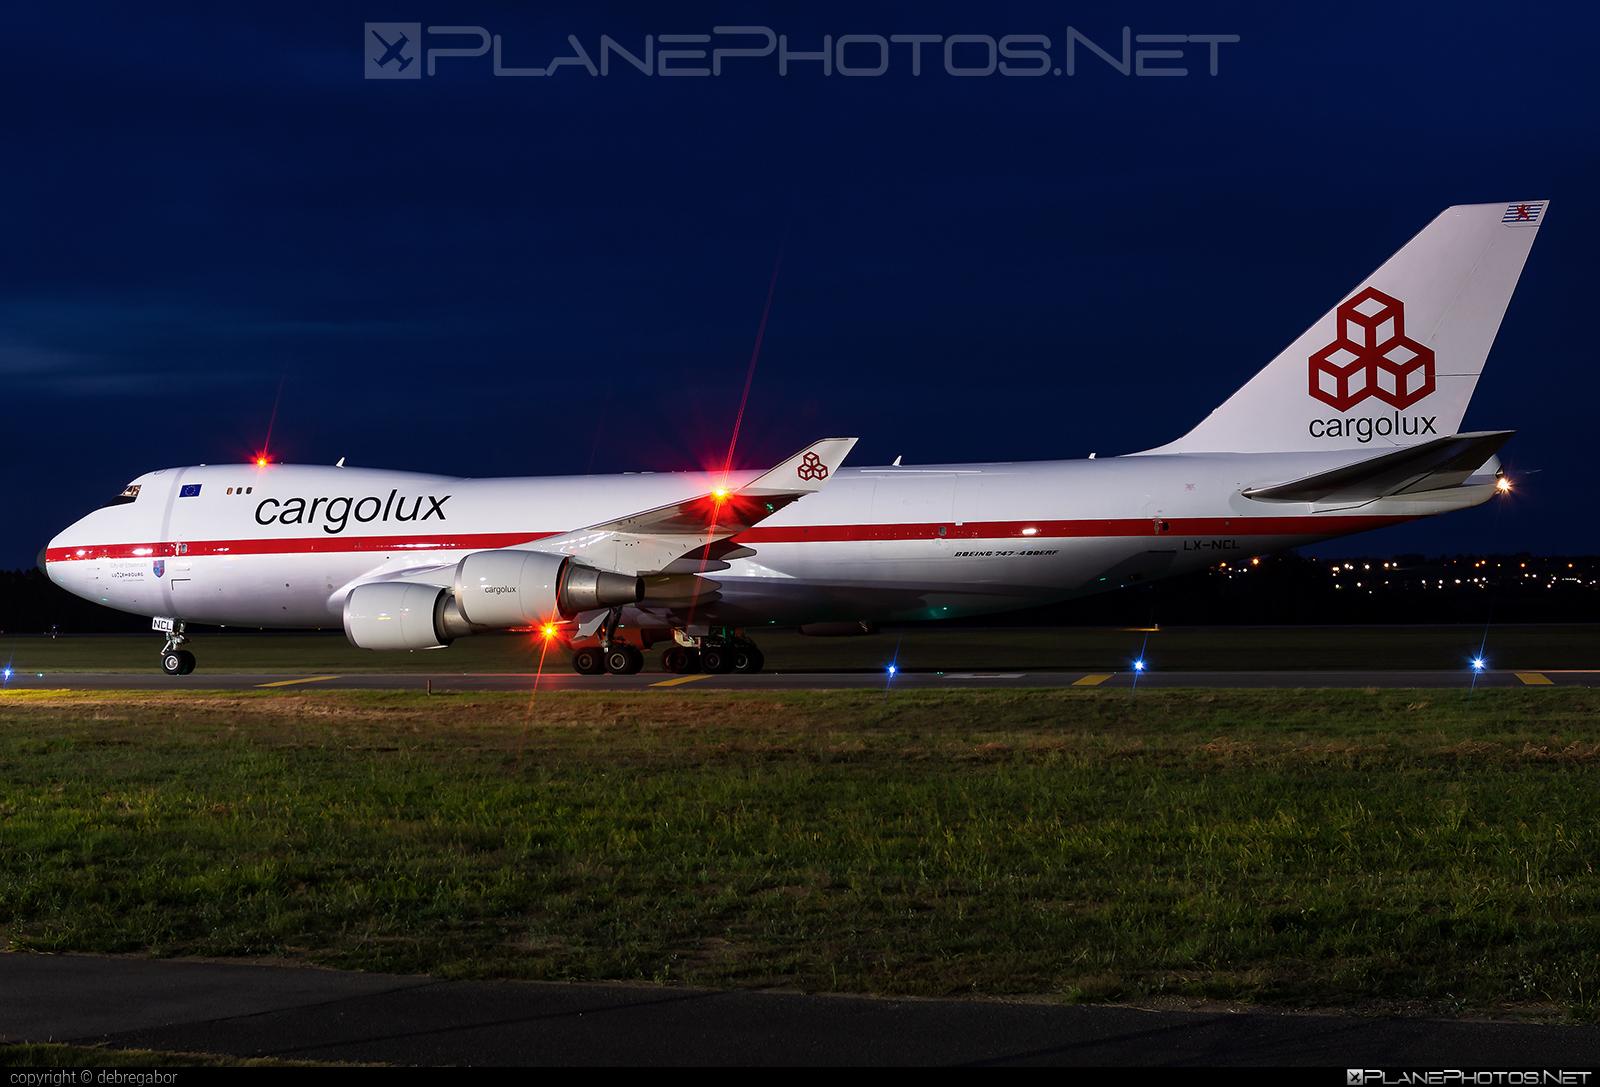 Boeing 747-400ERF - LX-NCL operated by Cargolux Airlines International #b747 #b747erf #b747freighter #boeing #boeing747 #cargolux #jumbo